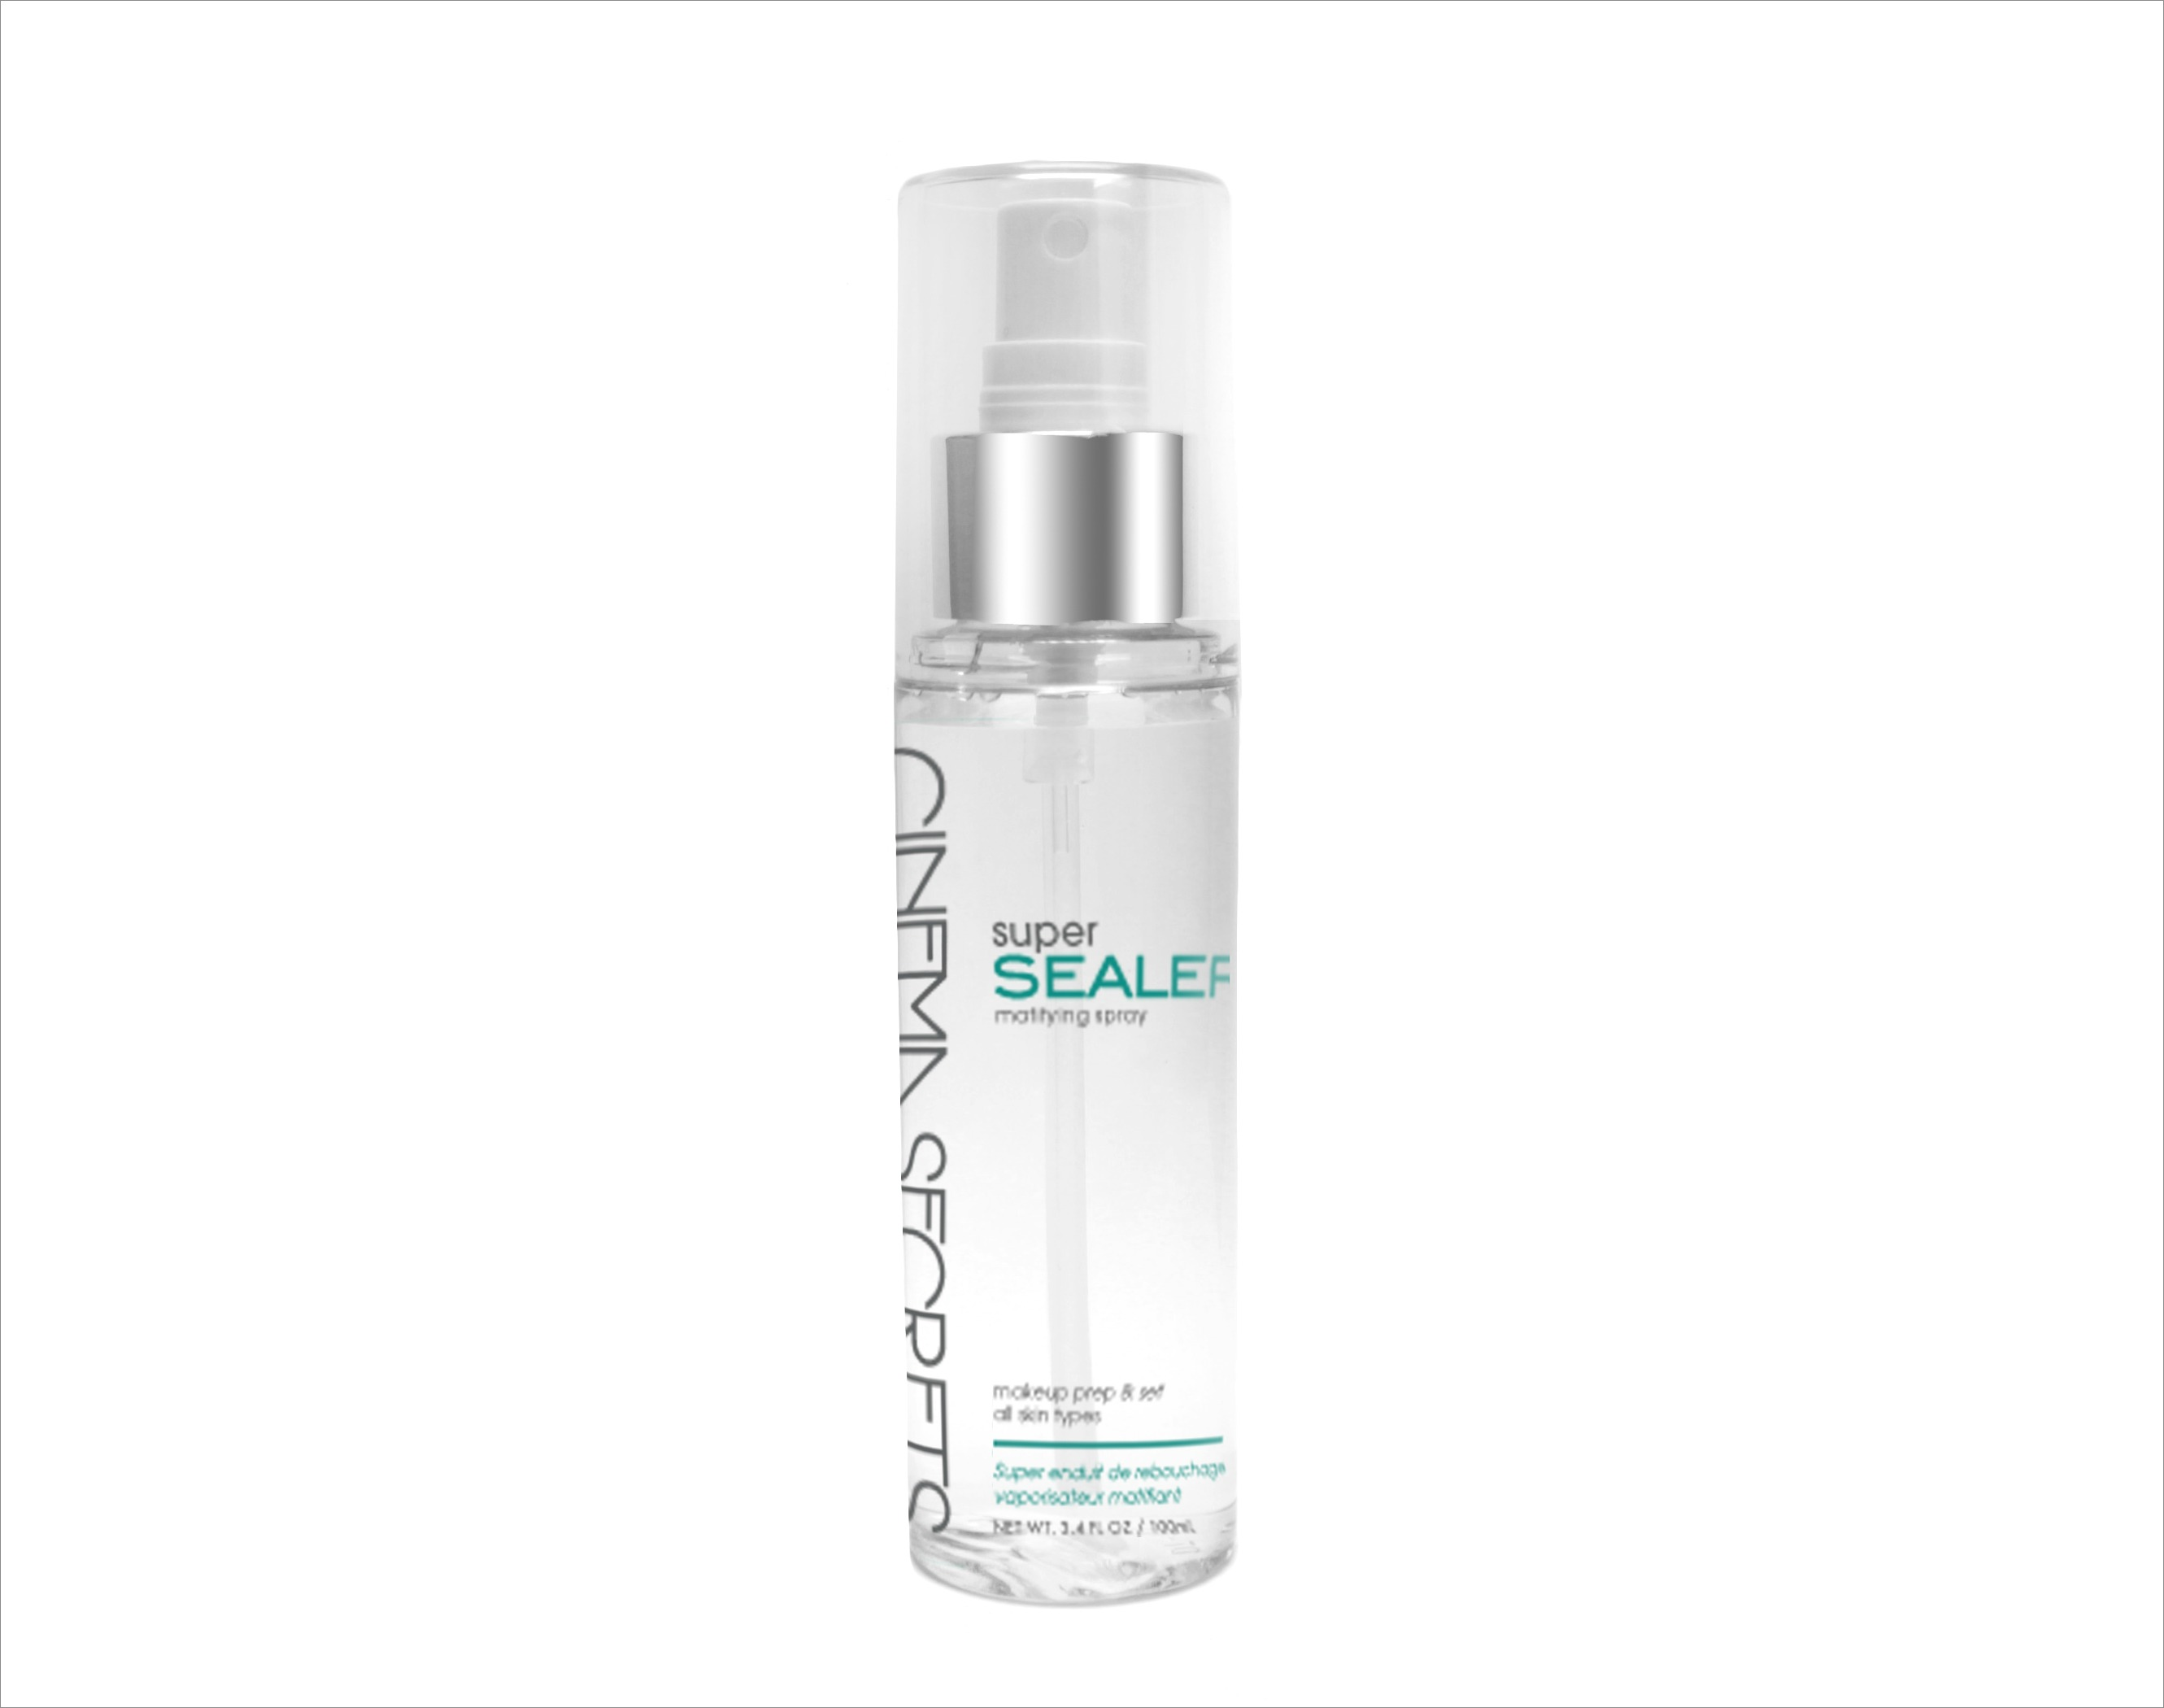 Cinema Secrets Super Sealer Mattifying Setting Spray available at Sephora